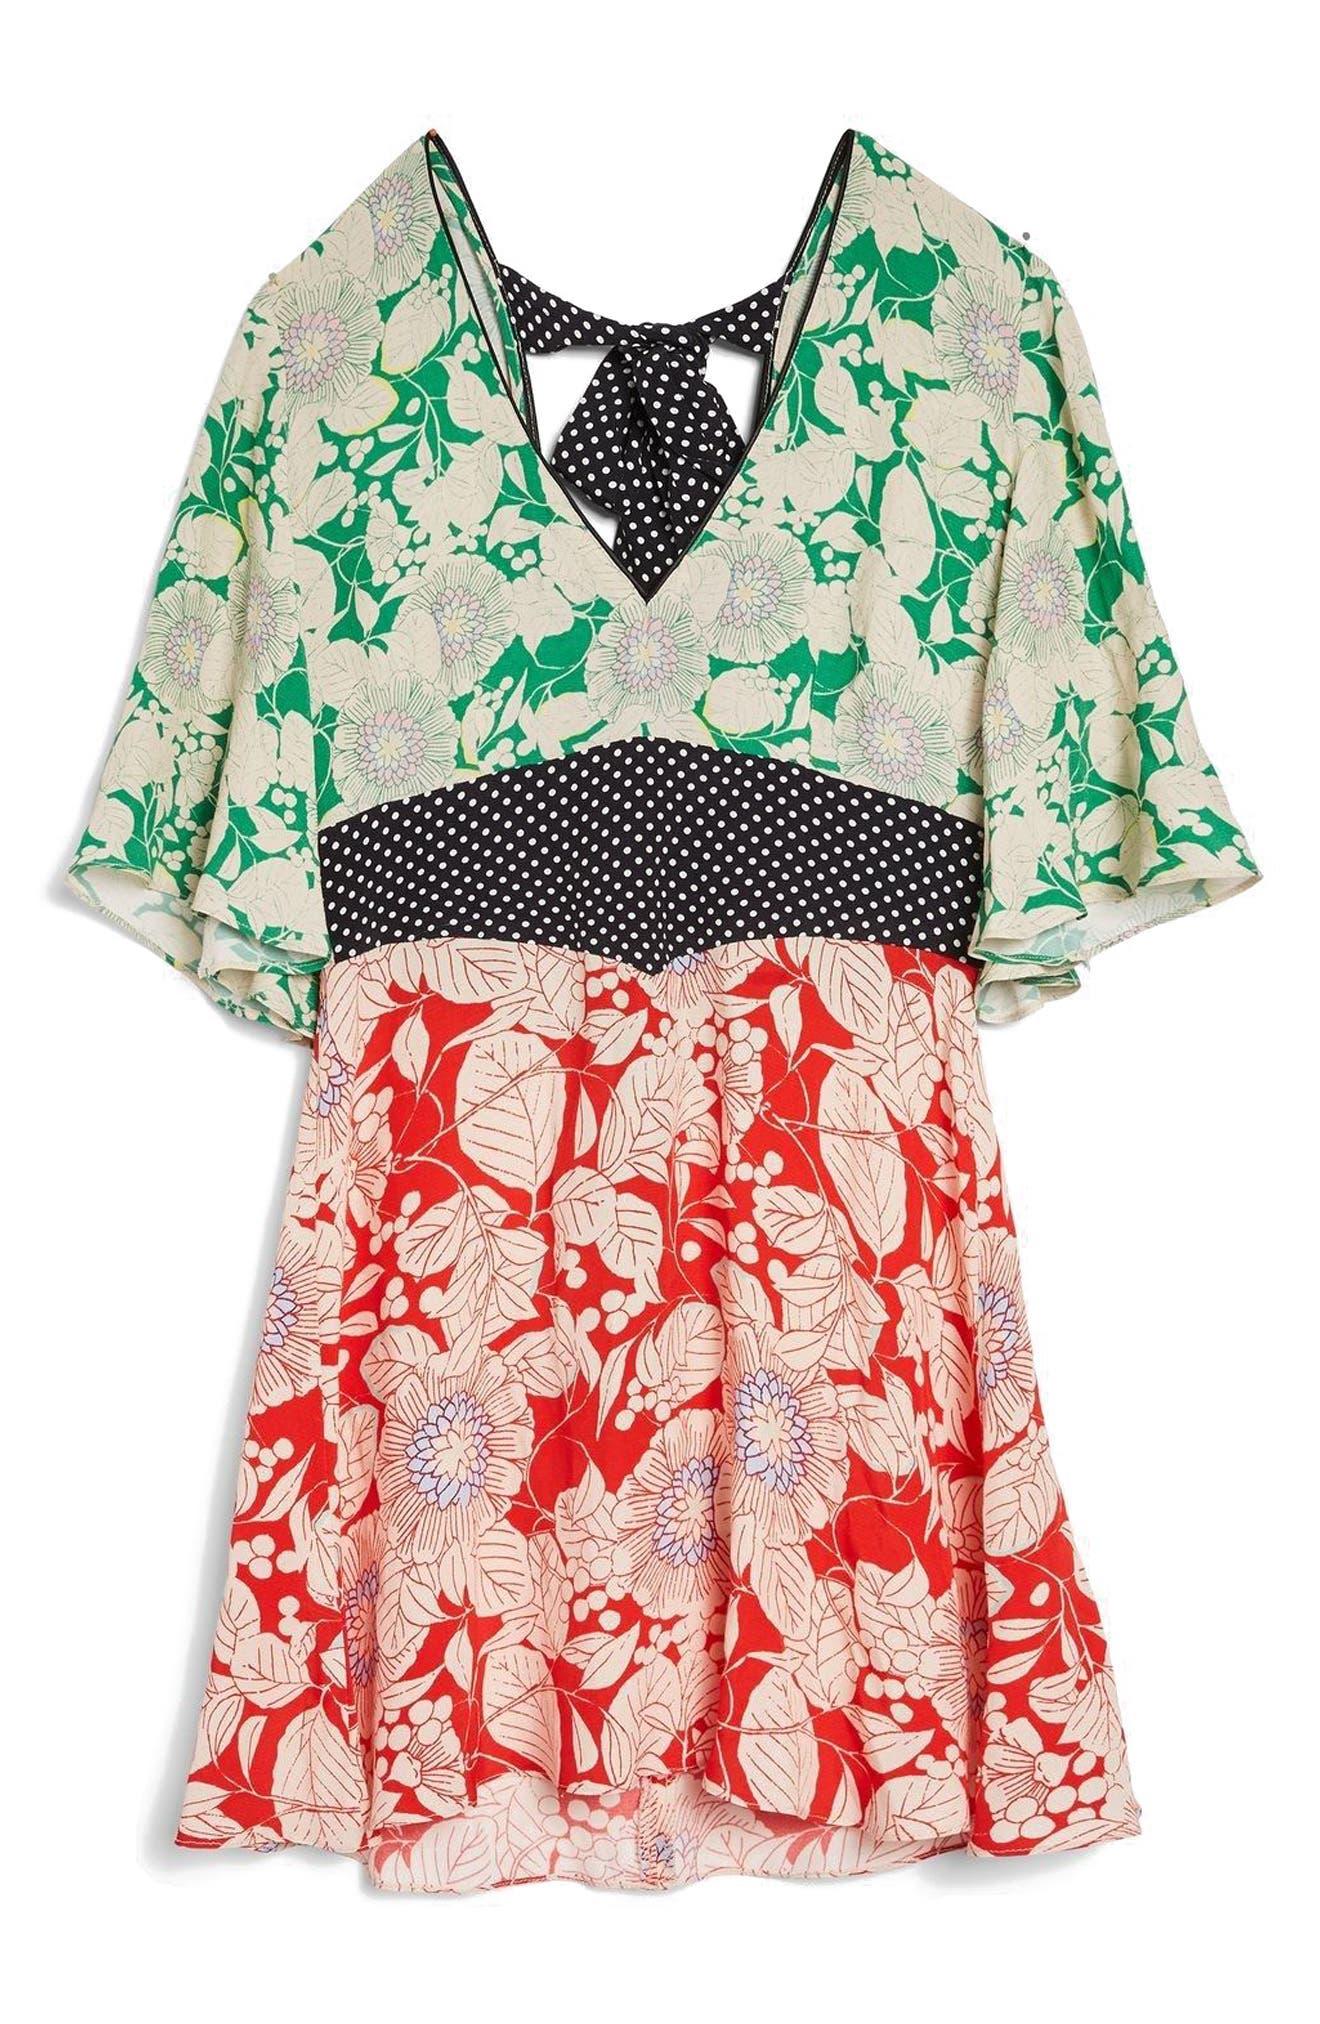 TOPSHOP,                             Mix Floral Print Minidress,                             Alternate thumbnail 4, color,                             600